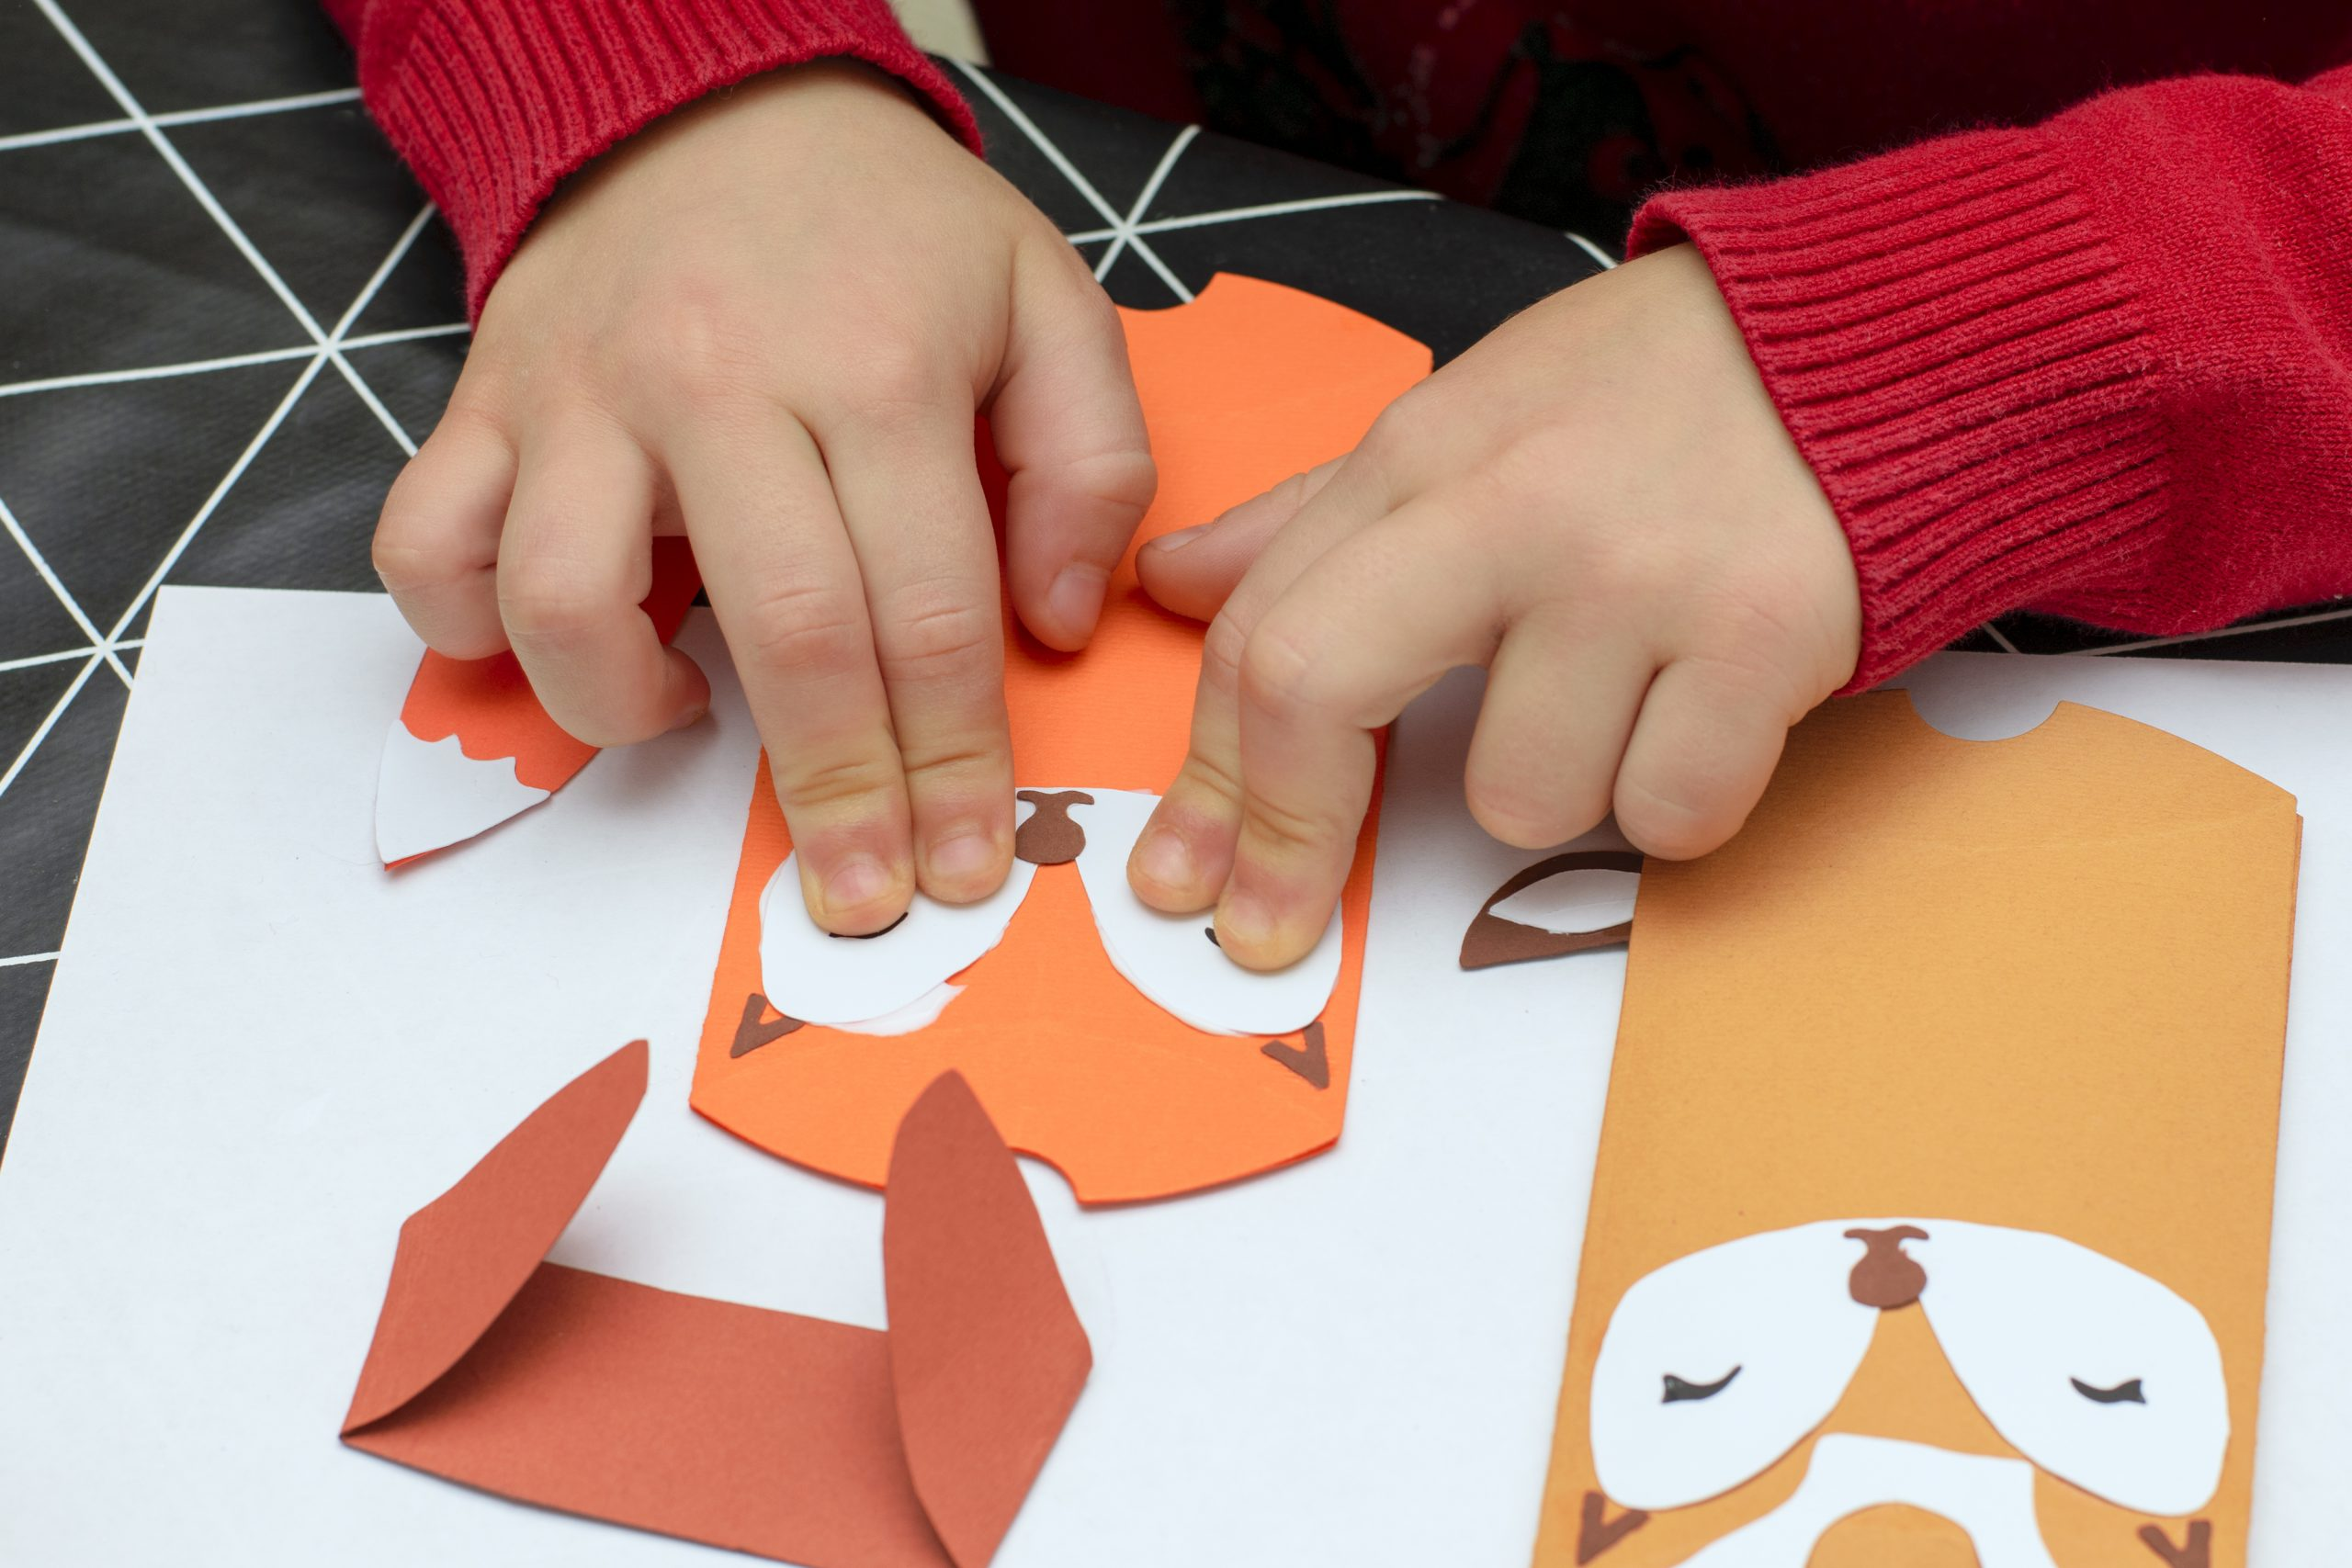 mandualidades para niños 3 a 5